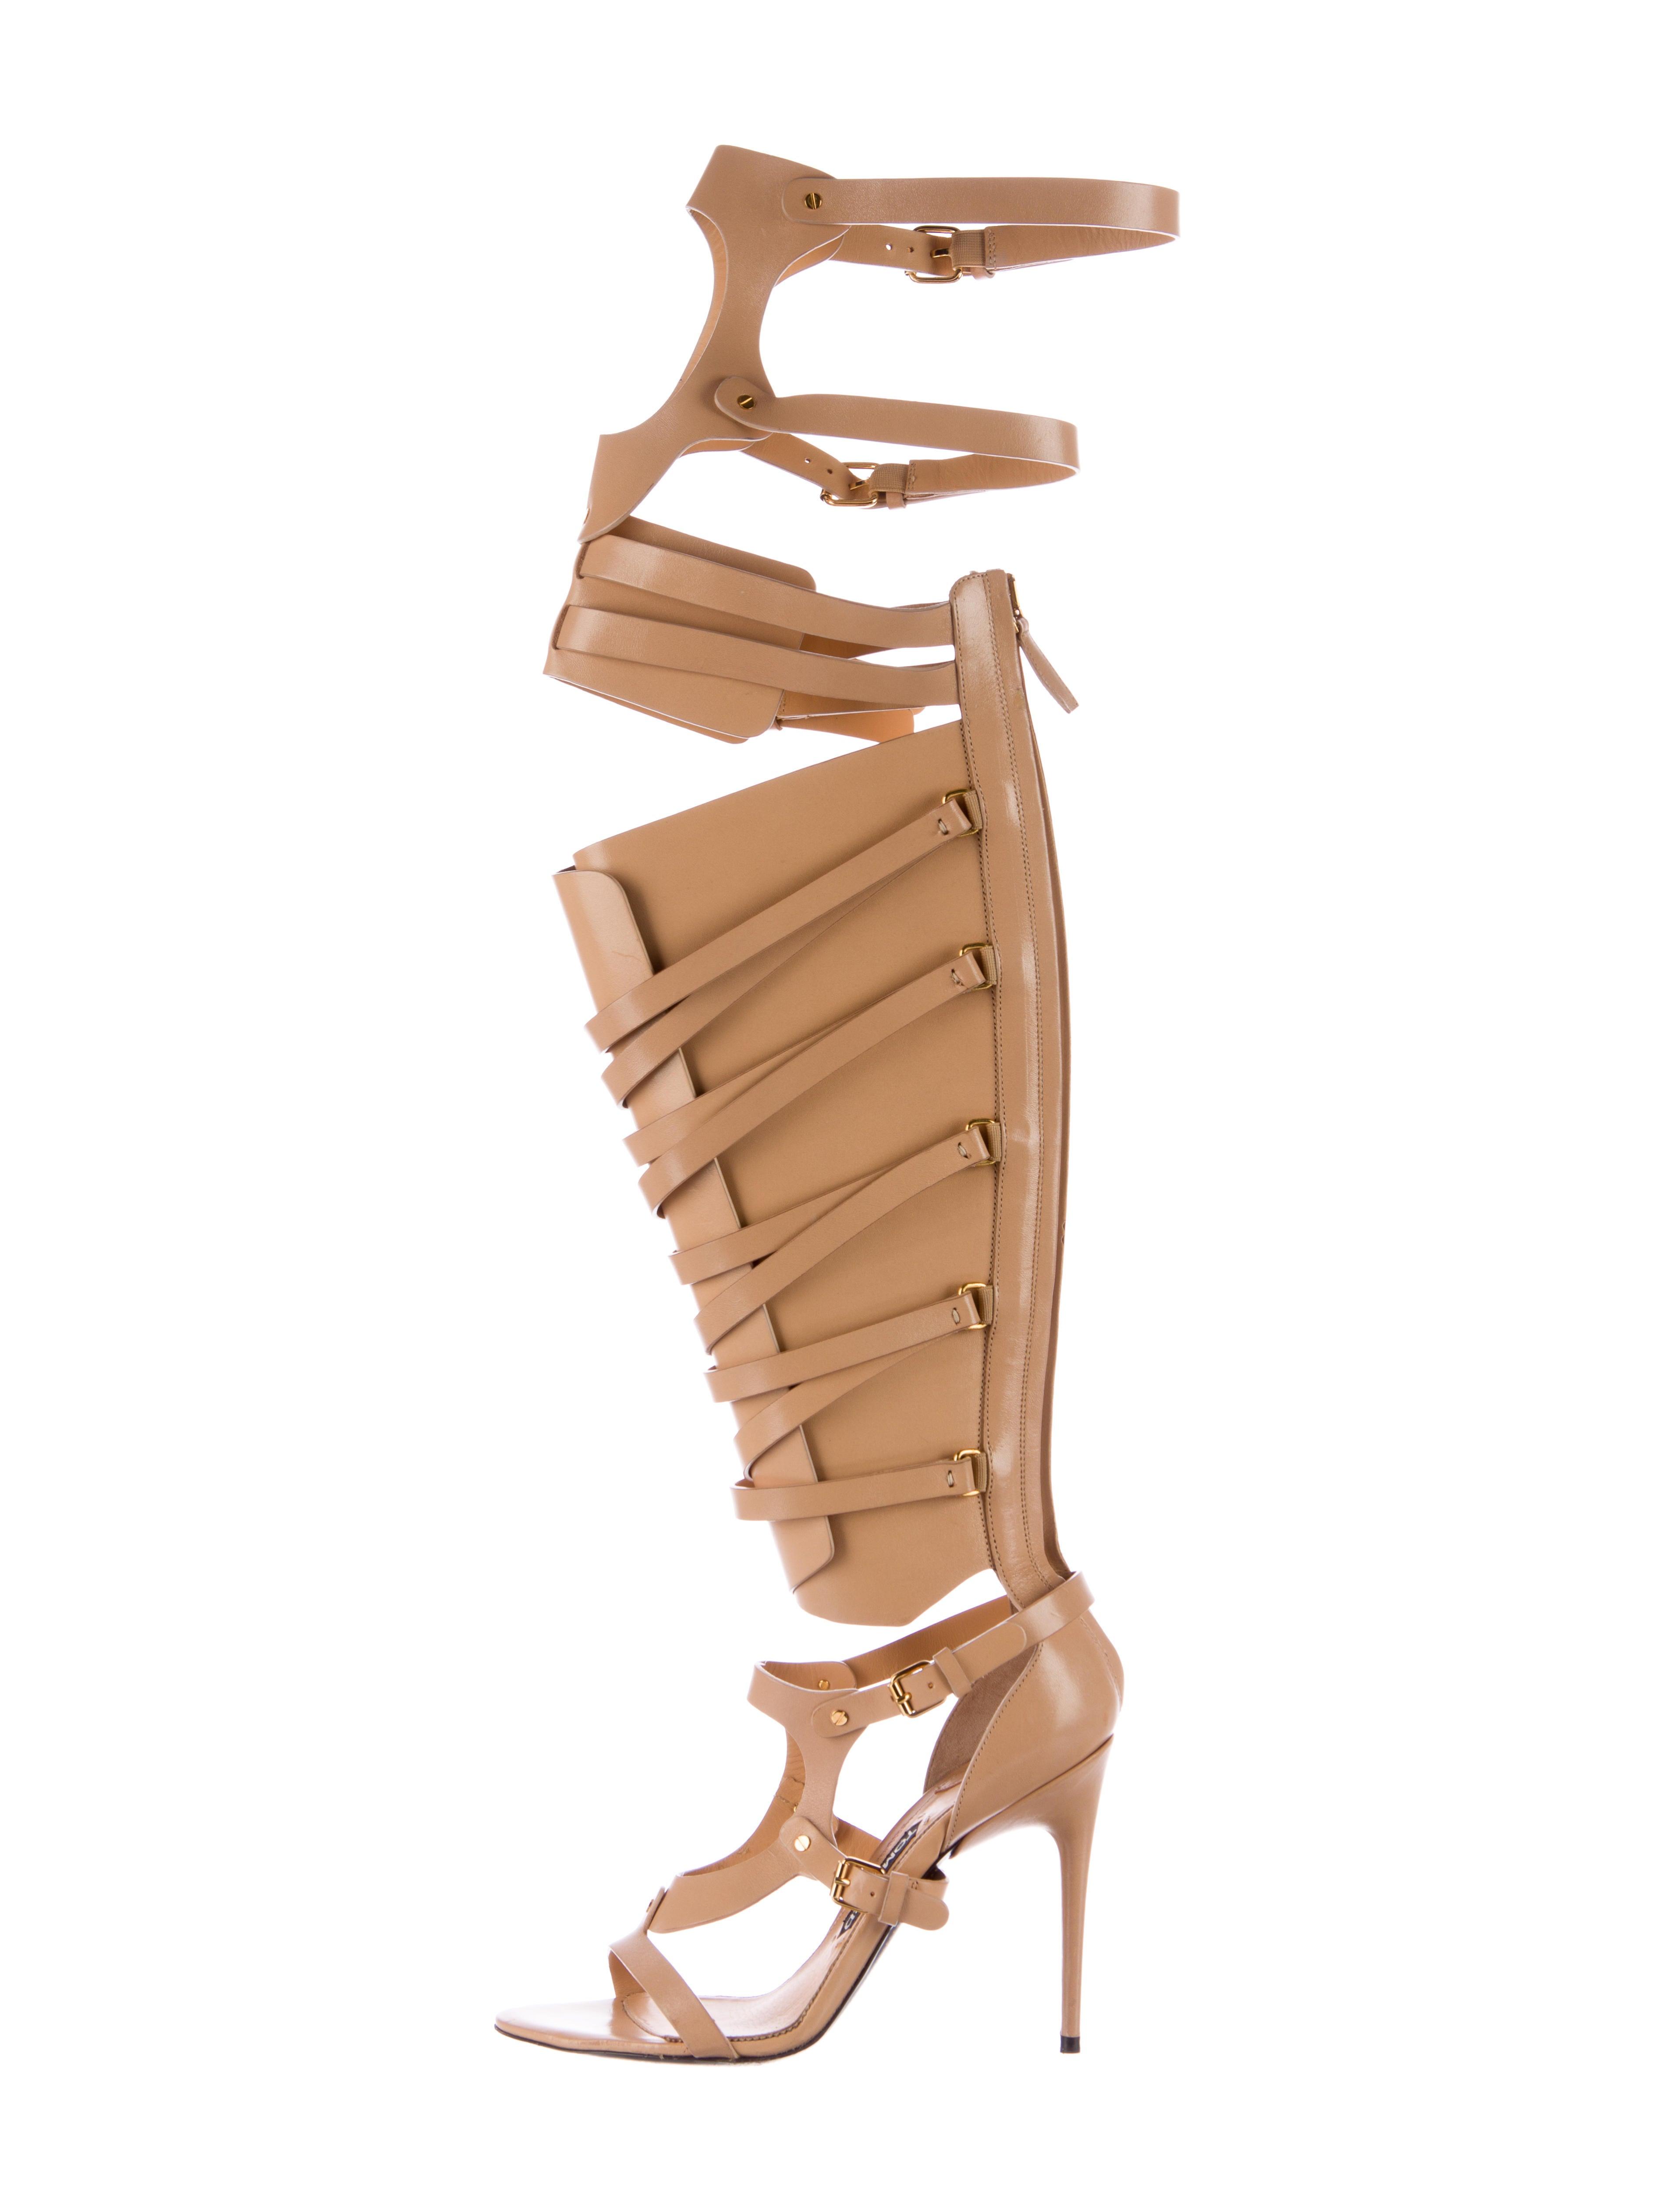 9e01db9ec1e2 Tom Ford Leather Gladiator Sandals - Shoes - TOM33920